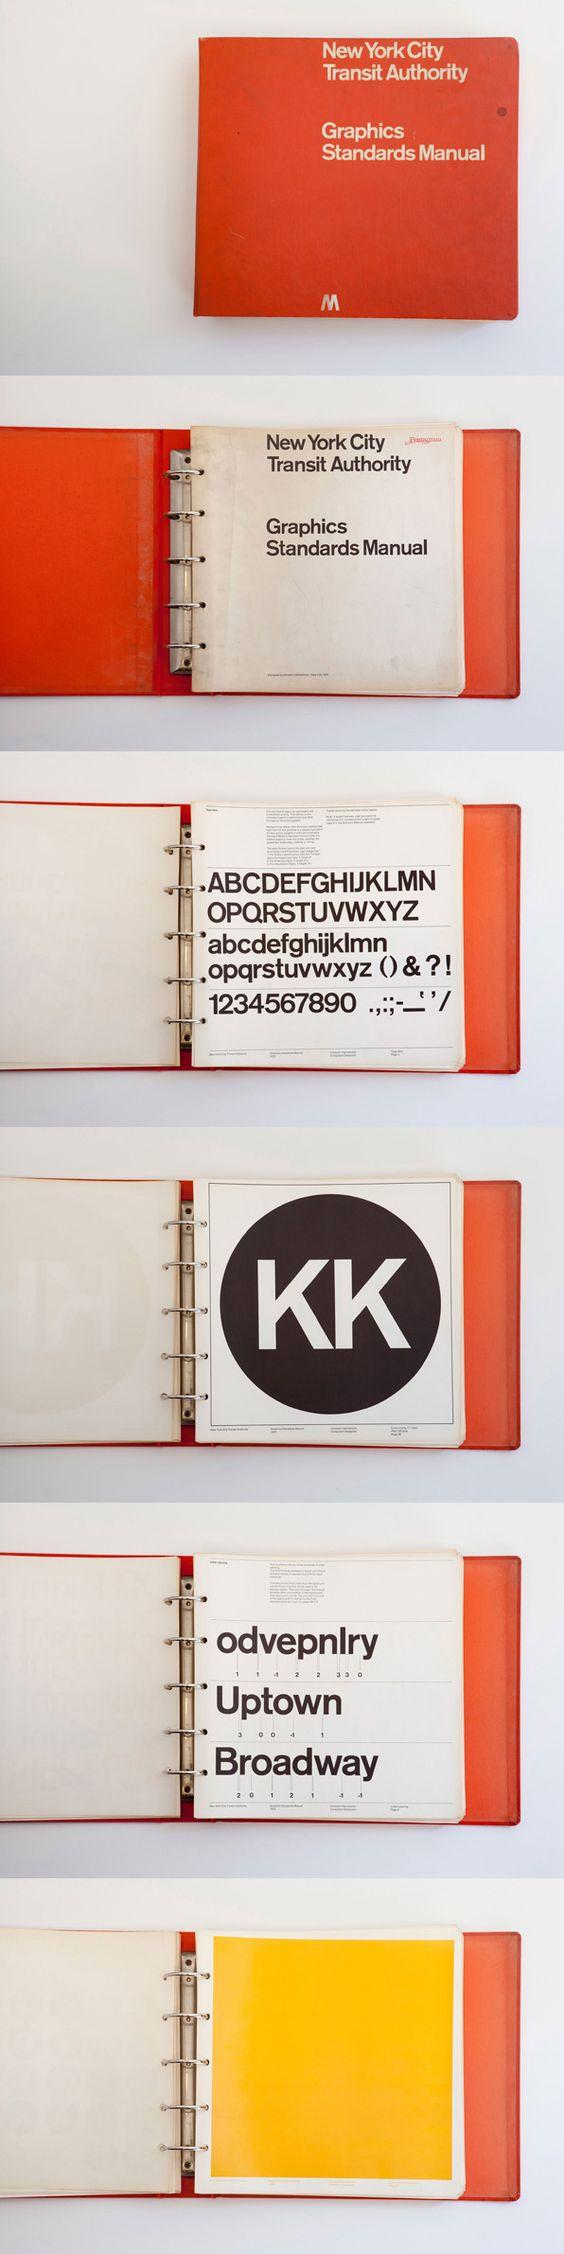 First edition NYCTA Graphics Standards Manual designed by Massimo Vignelli and Bob Noorda of Unimark International (1970) :: http://thestandardsmanual.com repinned by Awake — designedbyawake.com